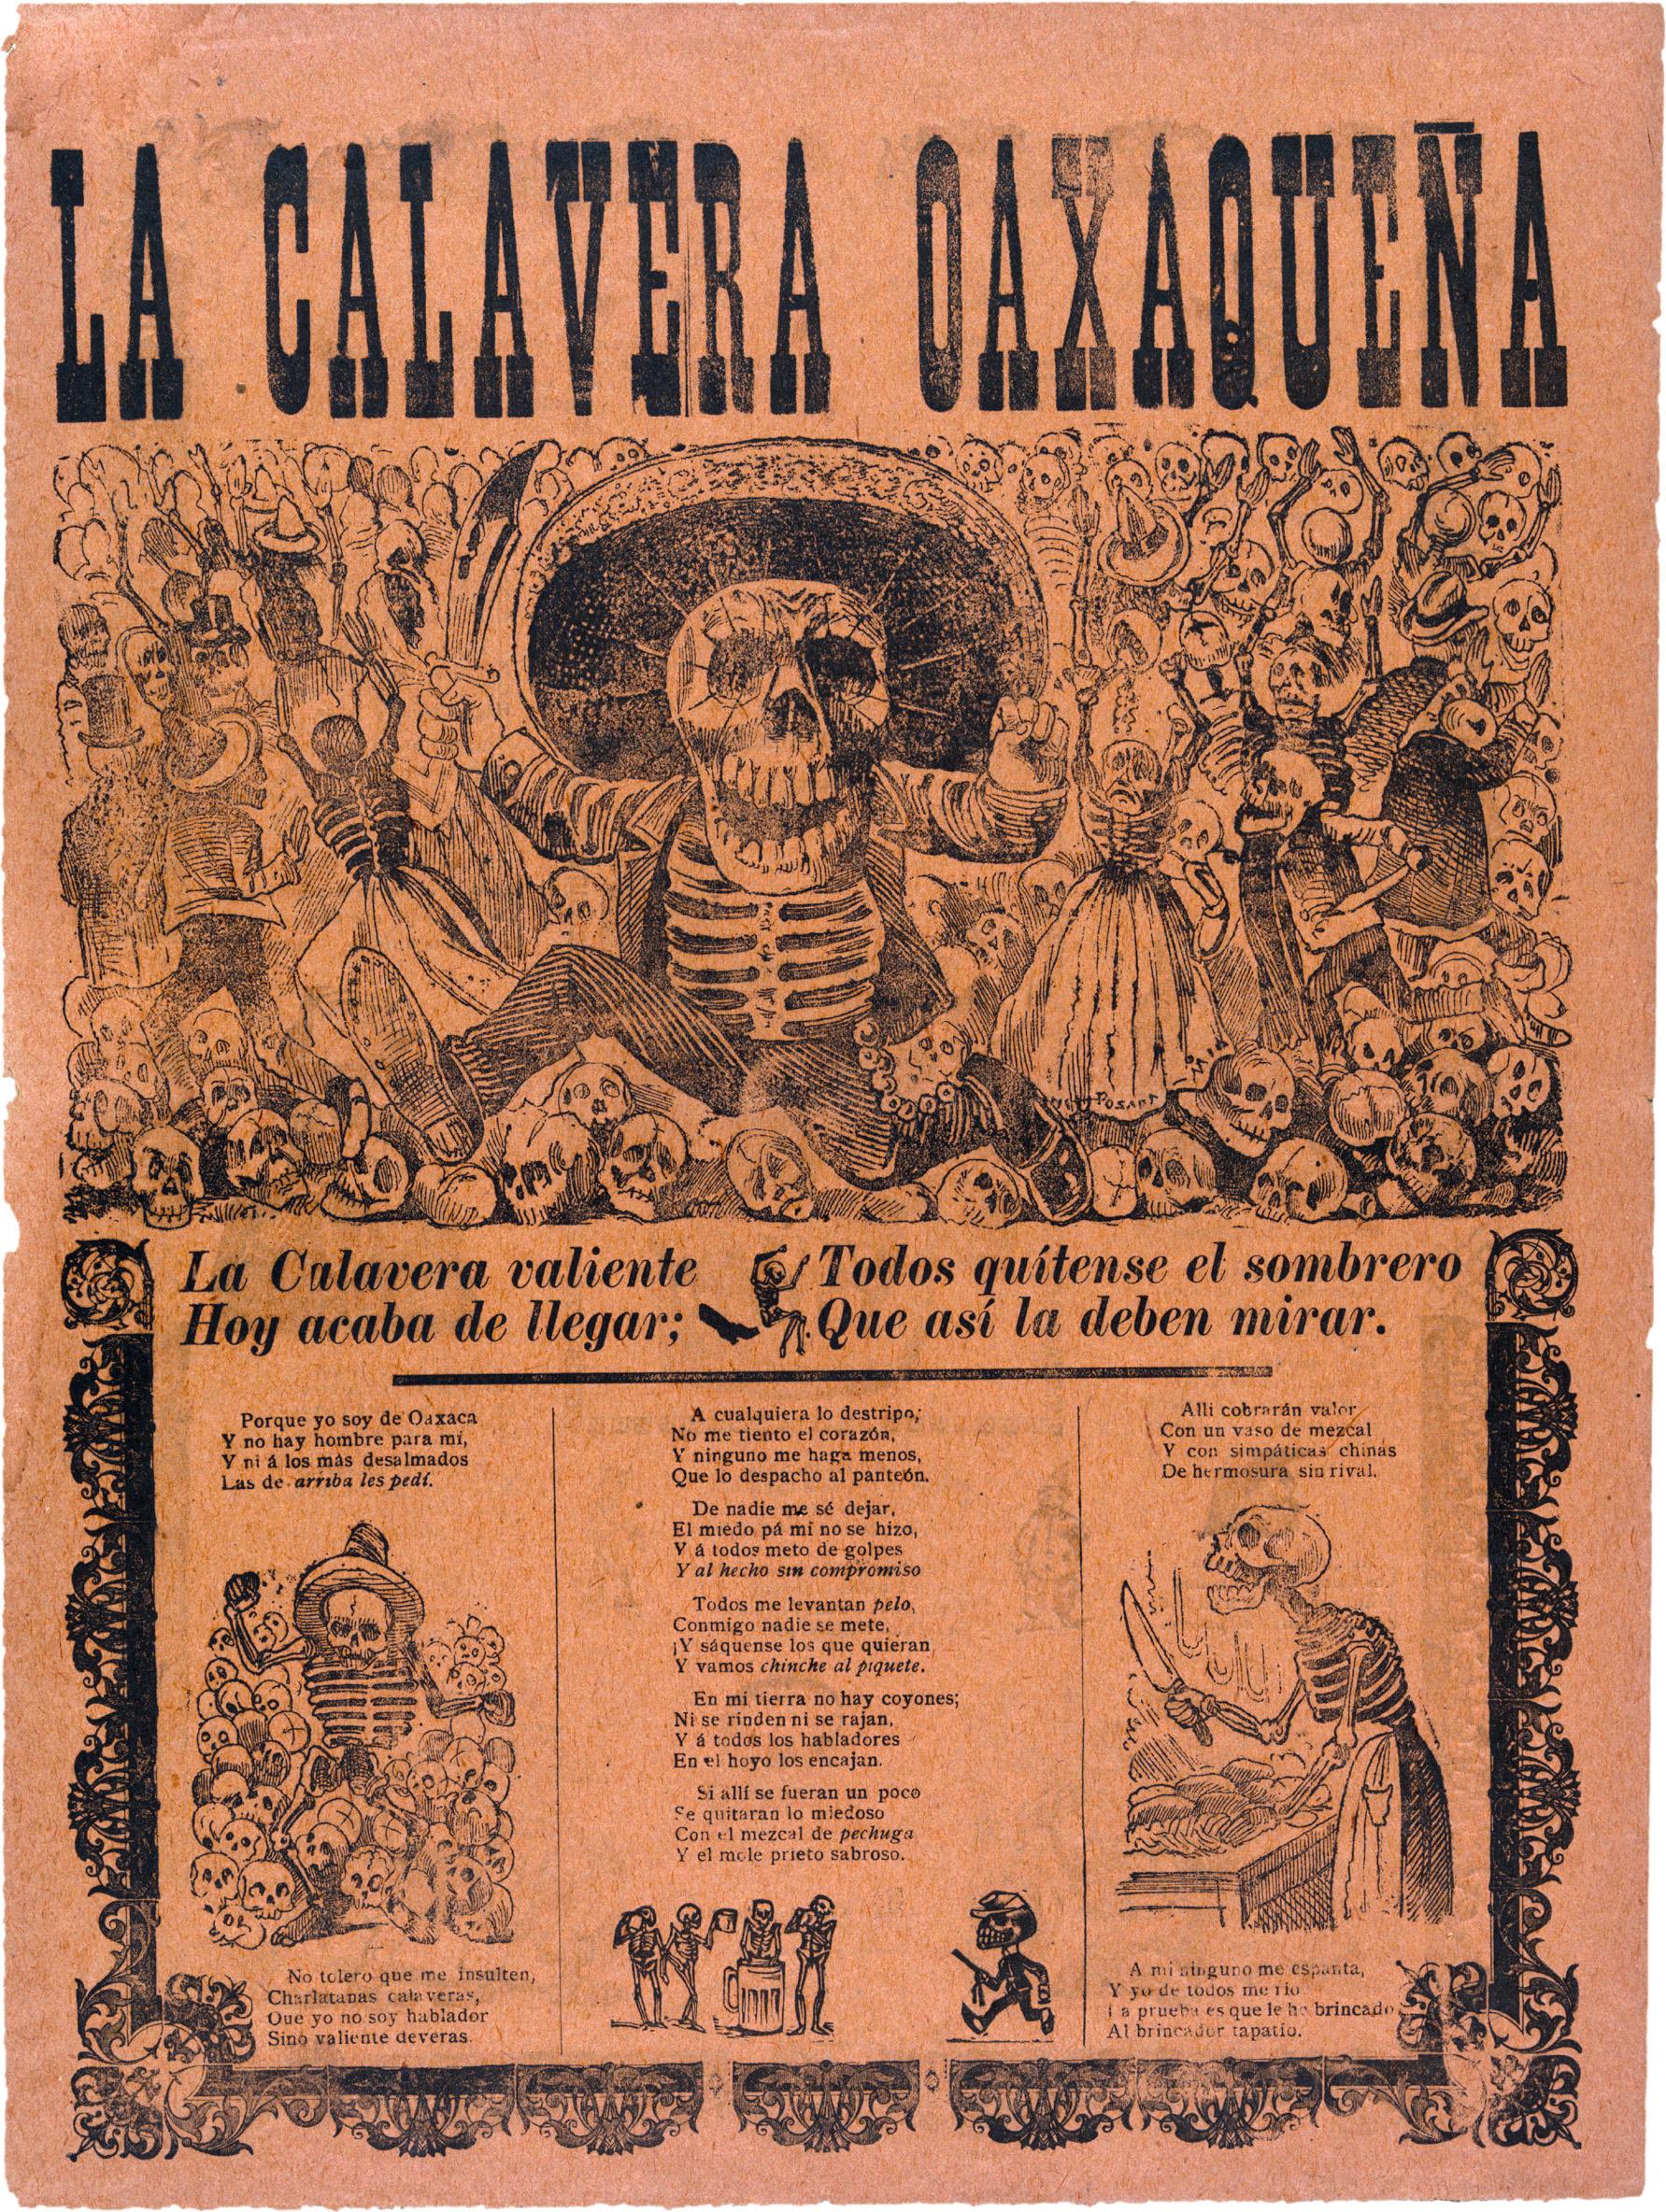 José_Guadalupe_Posada,_Calavera_oaxaqueñ